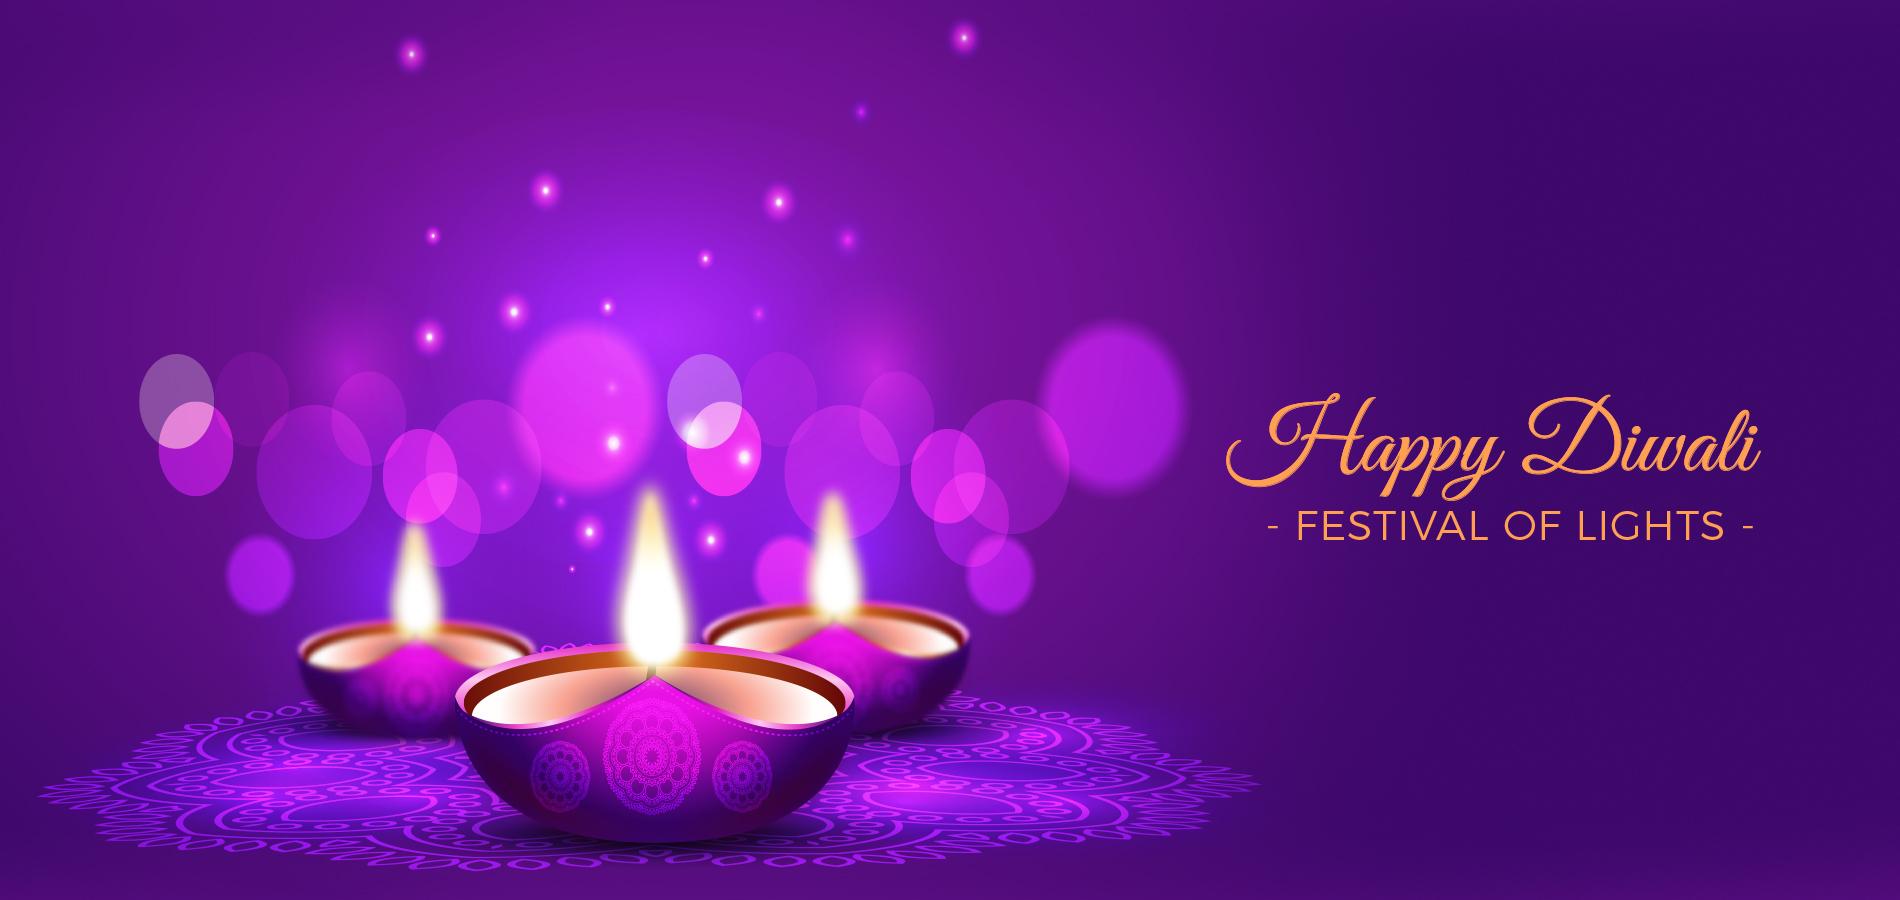 Happy Diwali Festival of Lights Web Banner